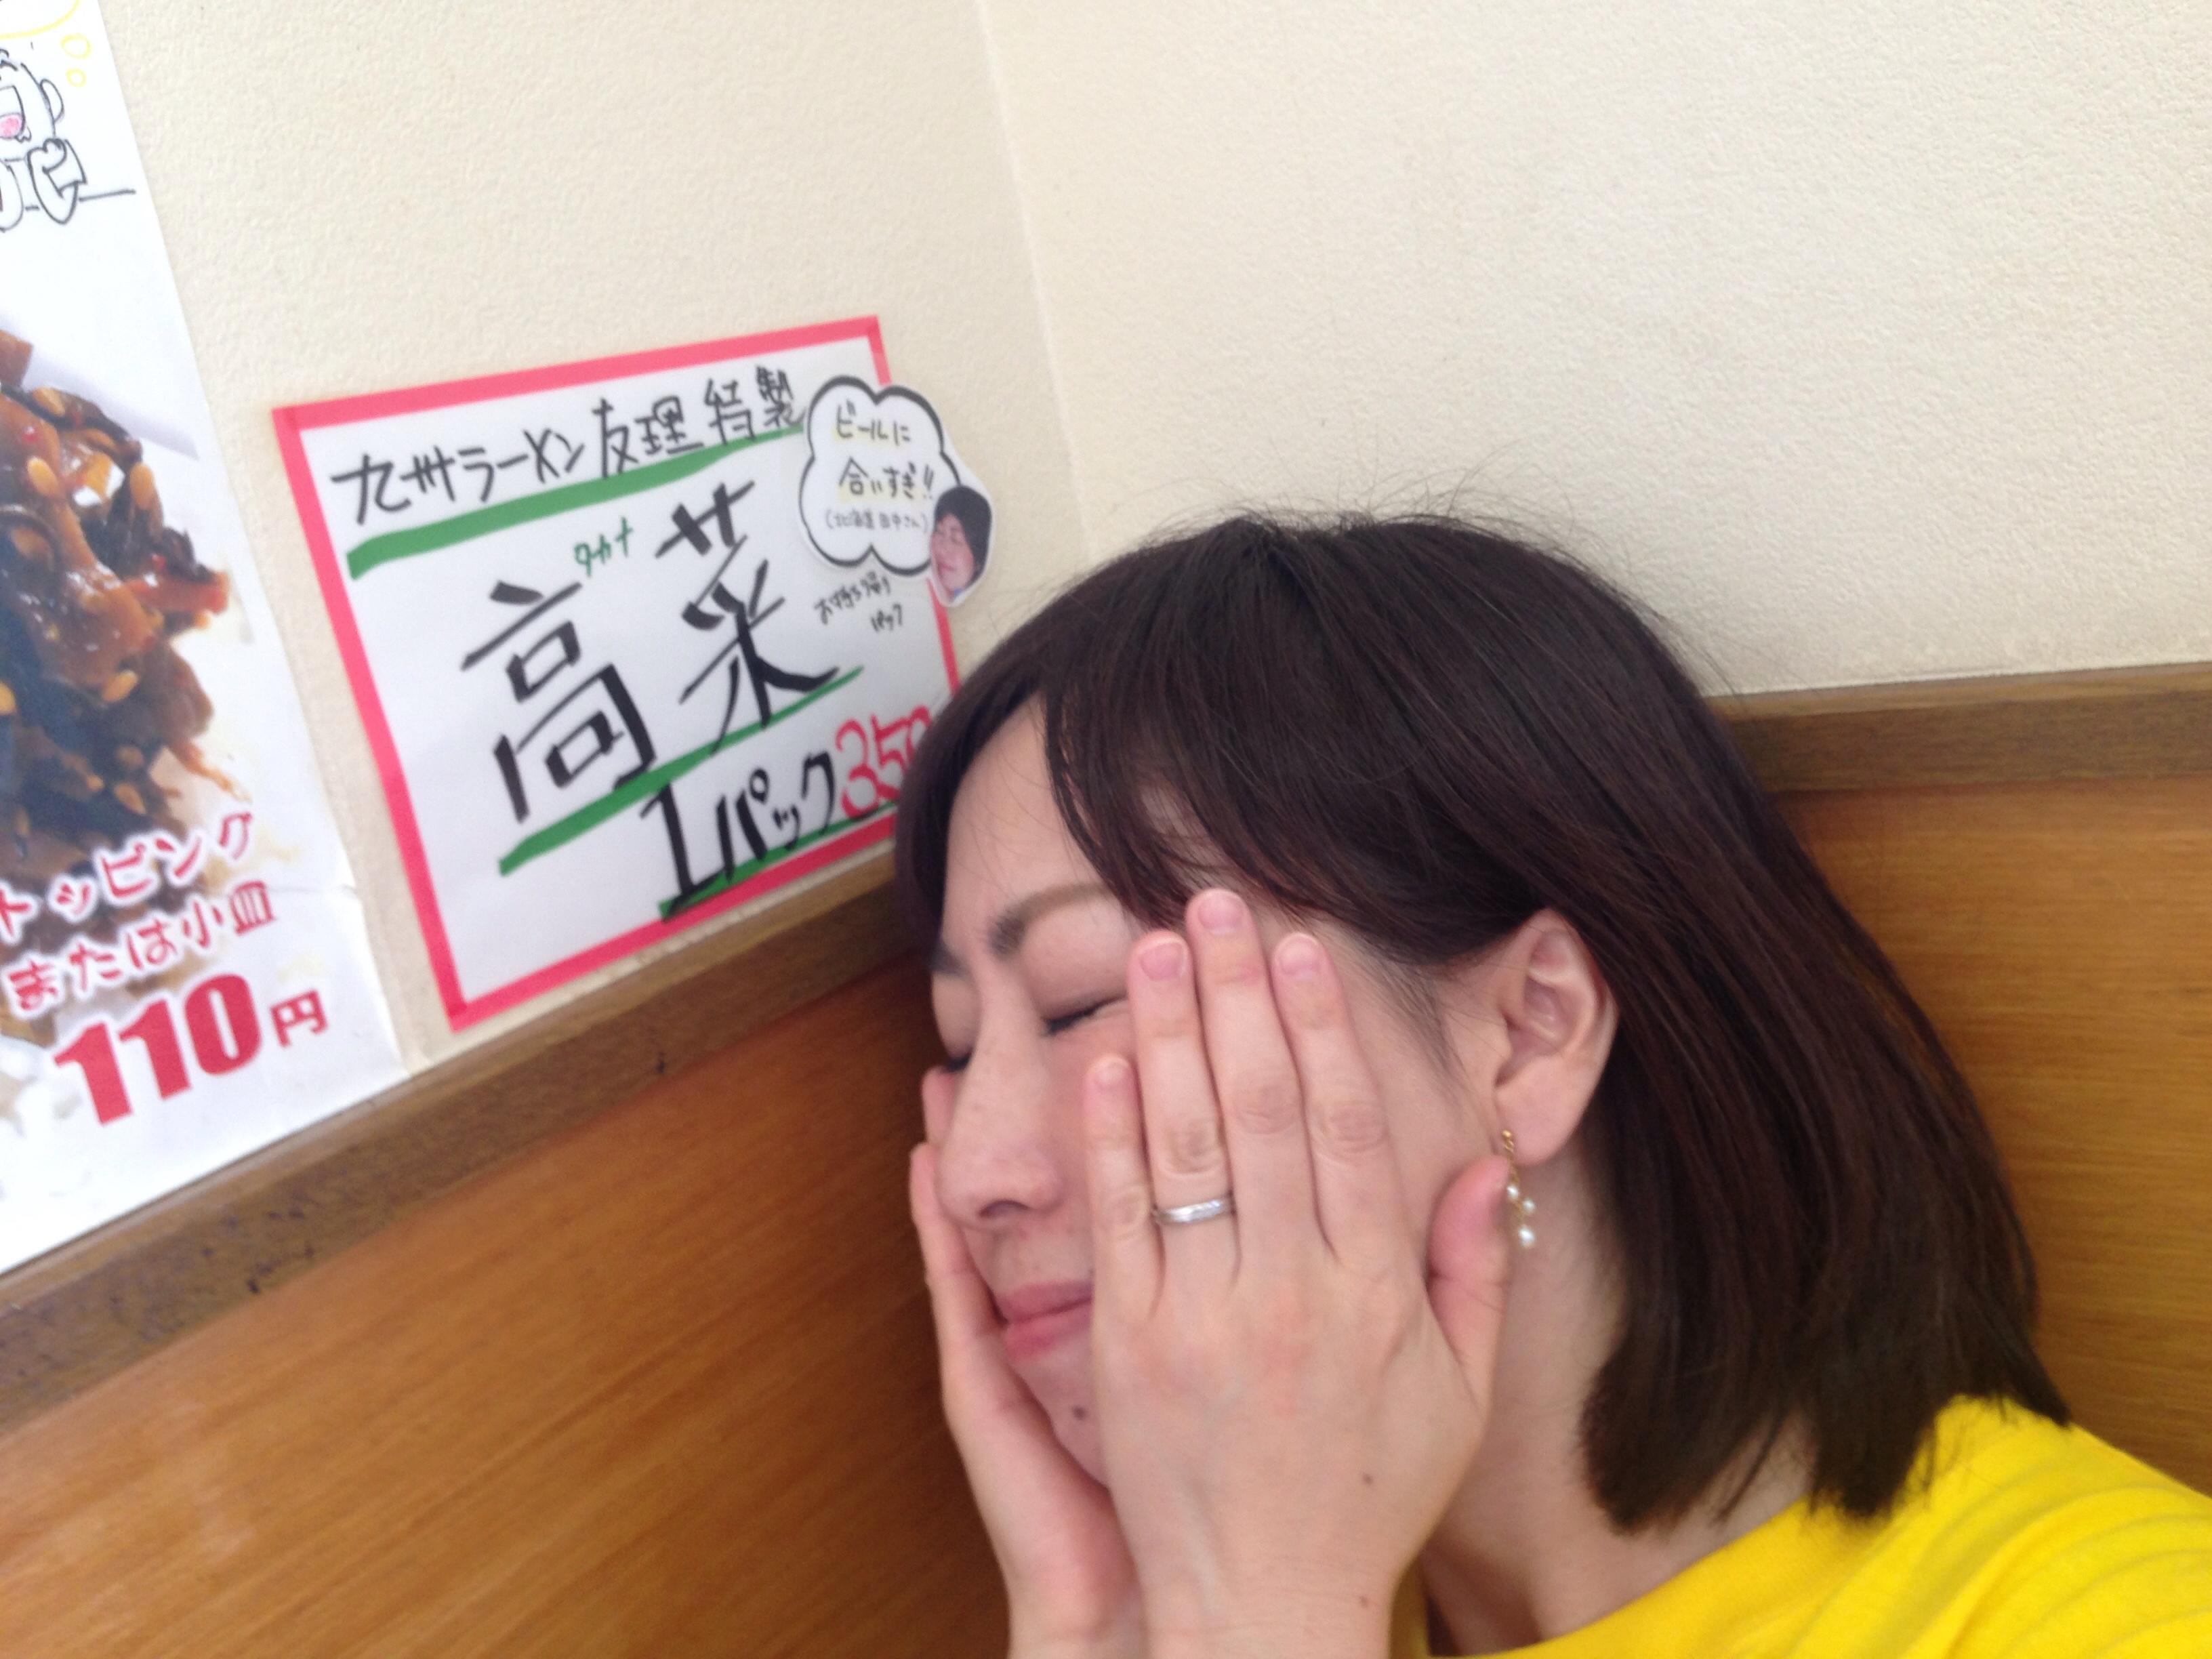 fc2blog_20160703235938090.jpg